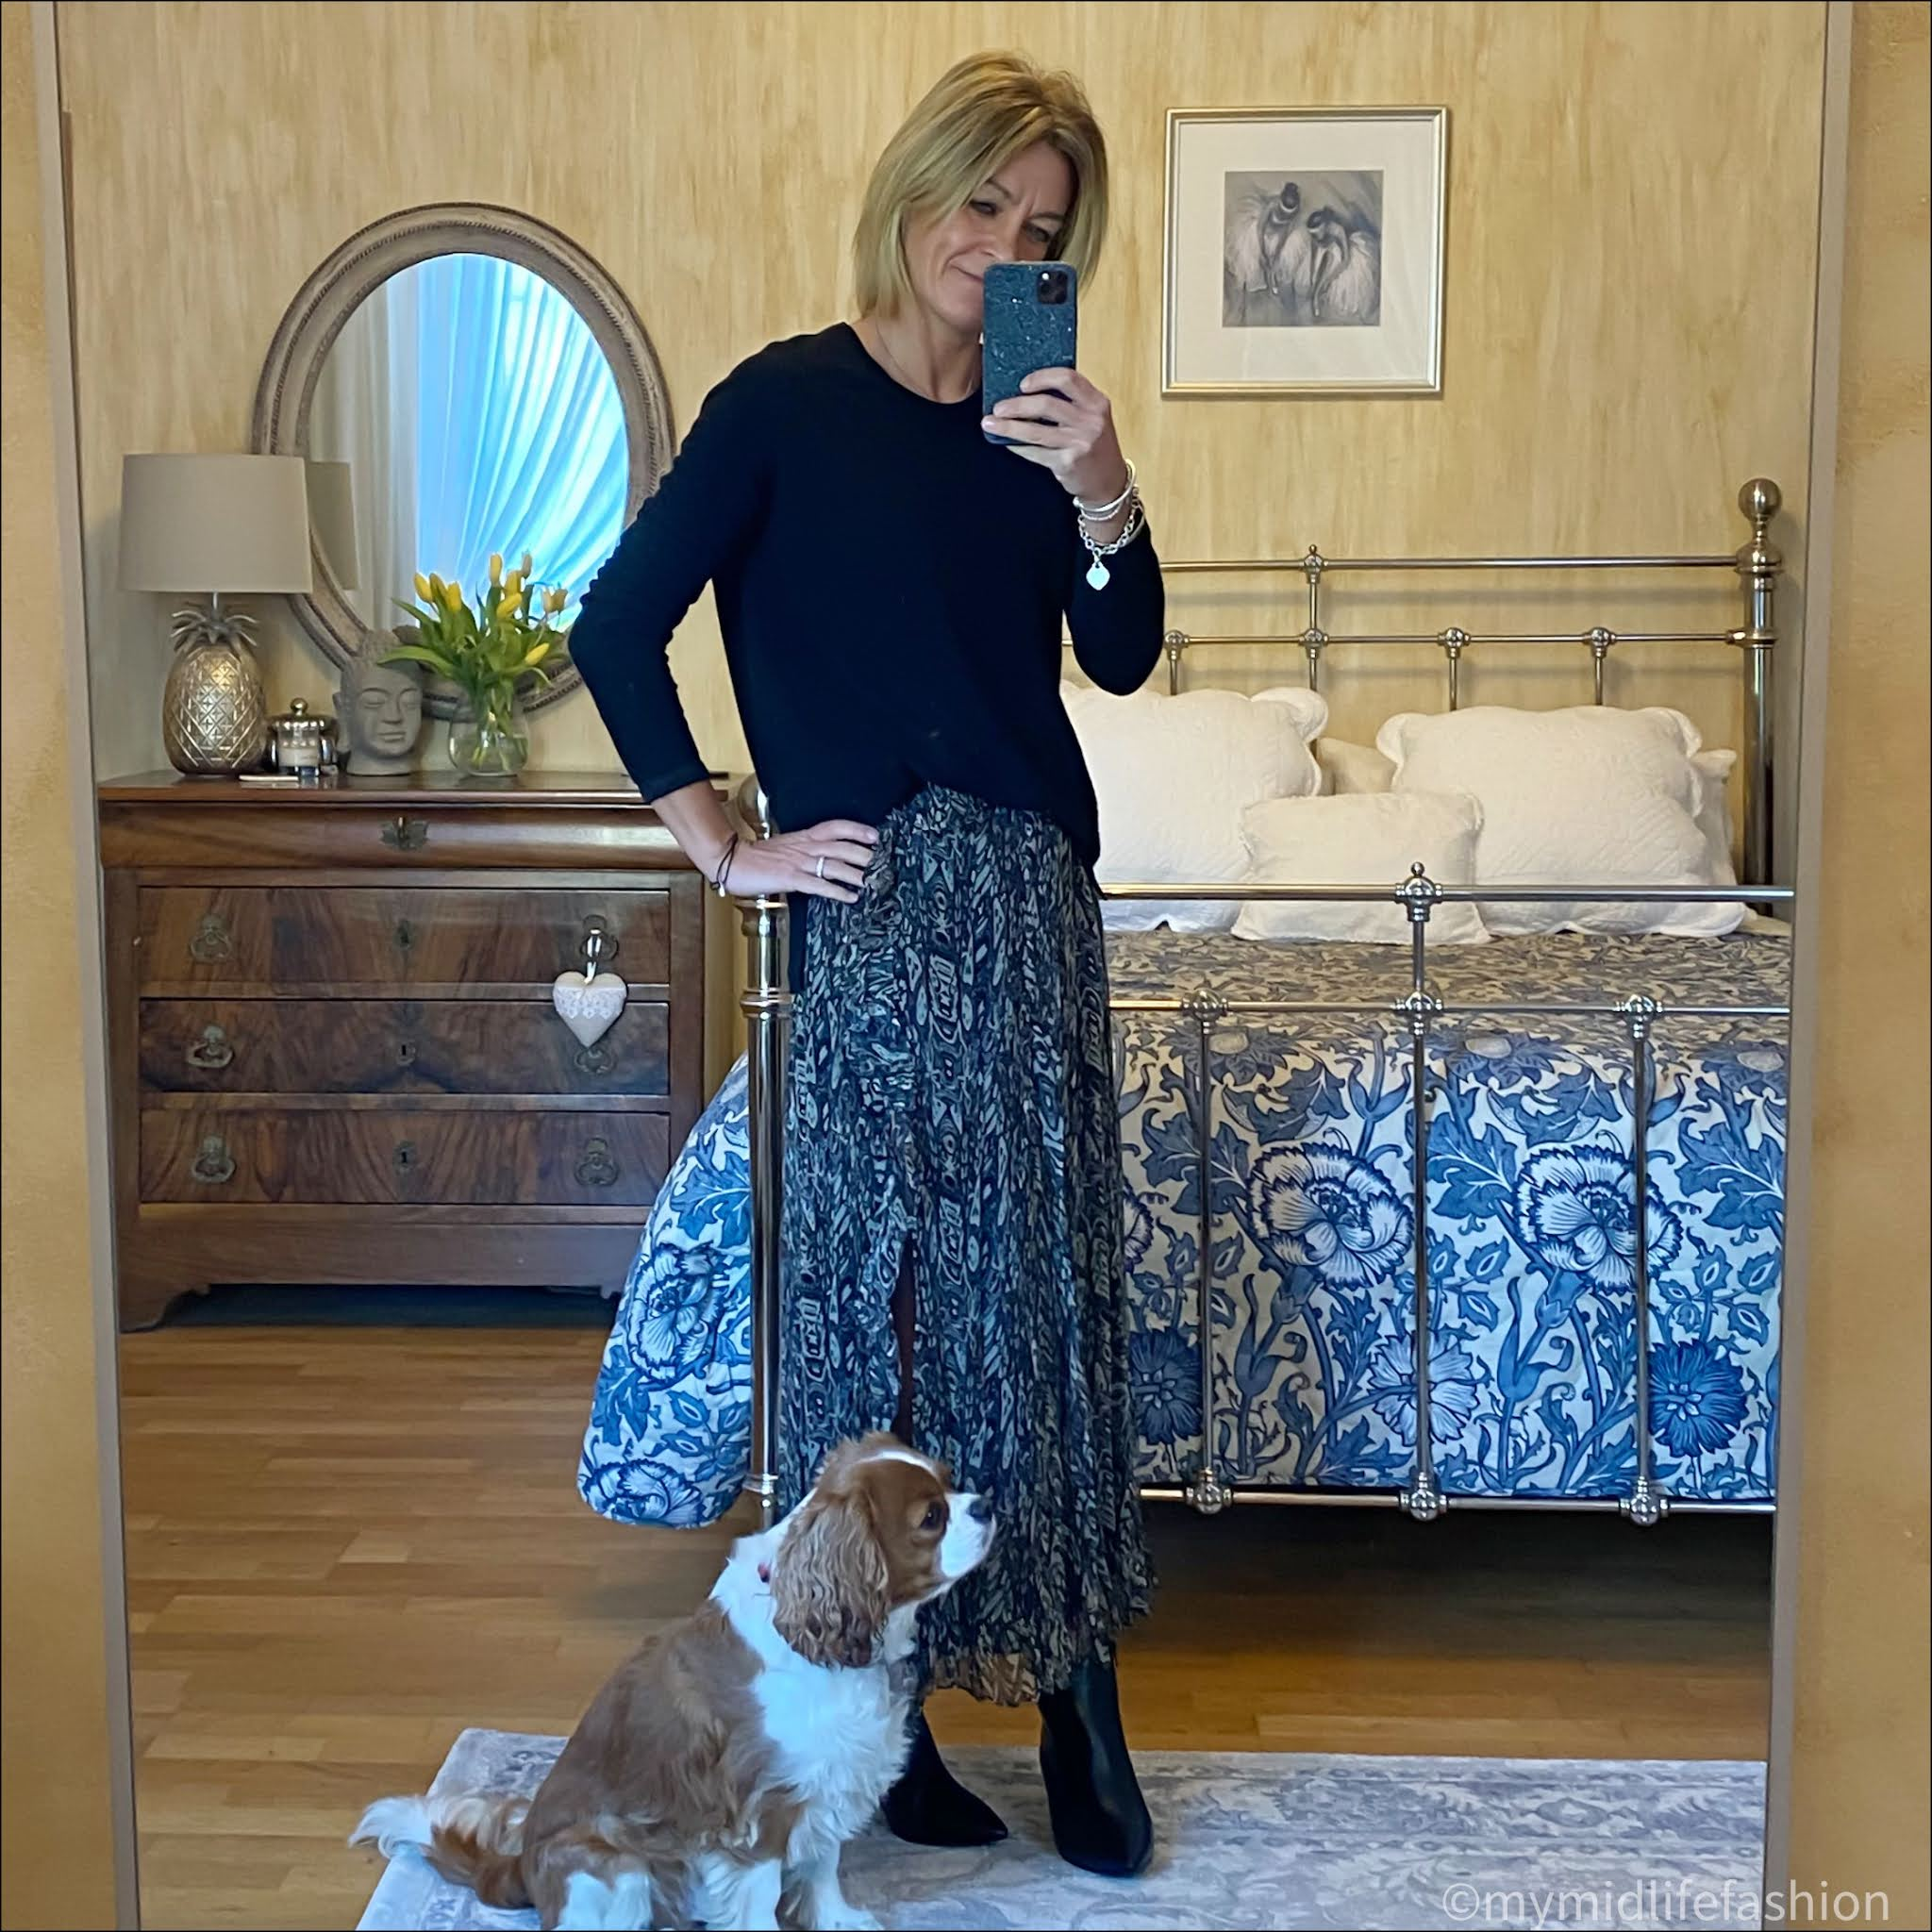 my midlife fashion, hush boyfriend cashmere jumper, iro Paris maxi skirt, sole bliss Brooke black leather ankle boot